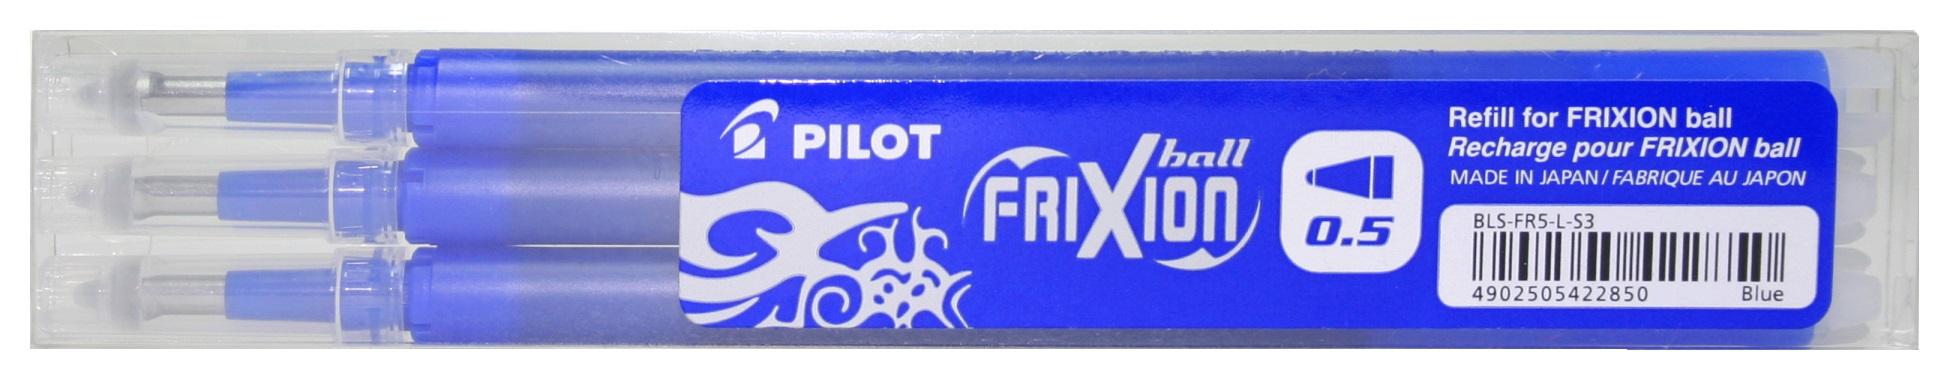 Náplň Frixion PILOT 0,5 mm, 3 ks - modrá 2065-003